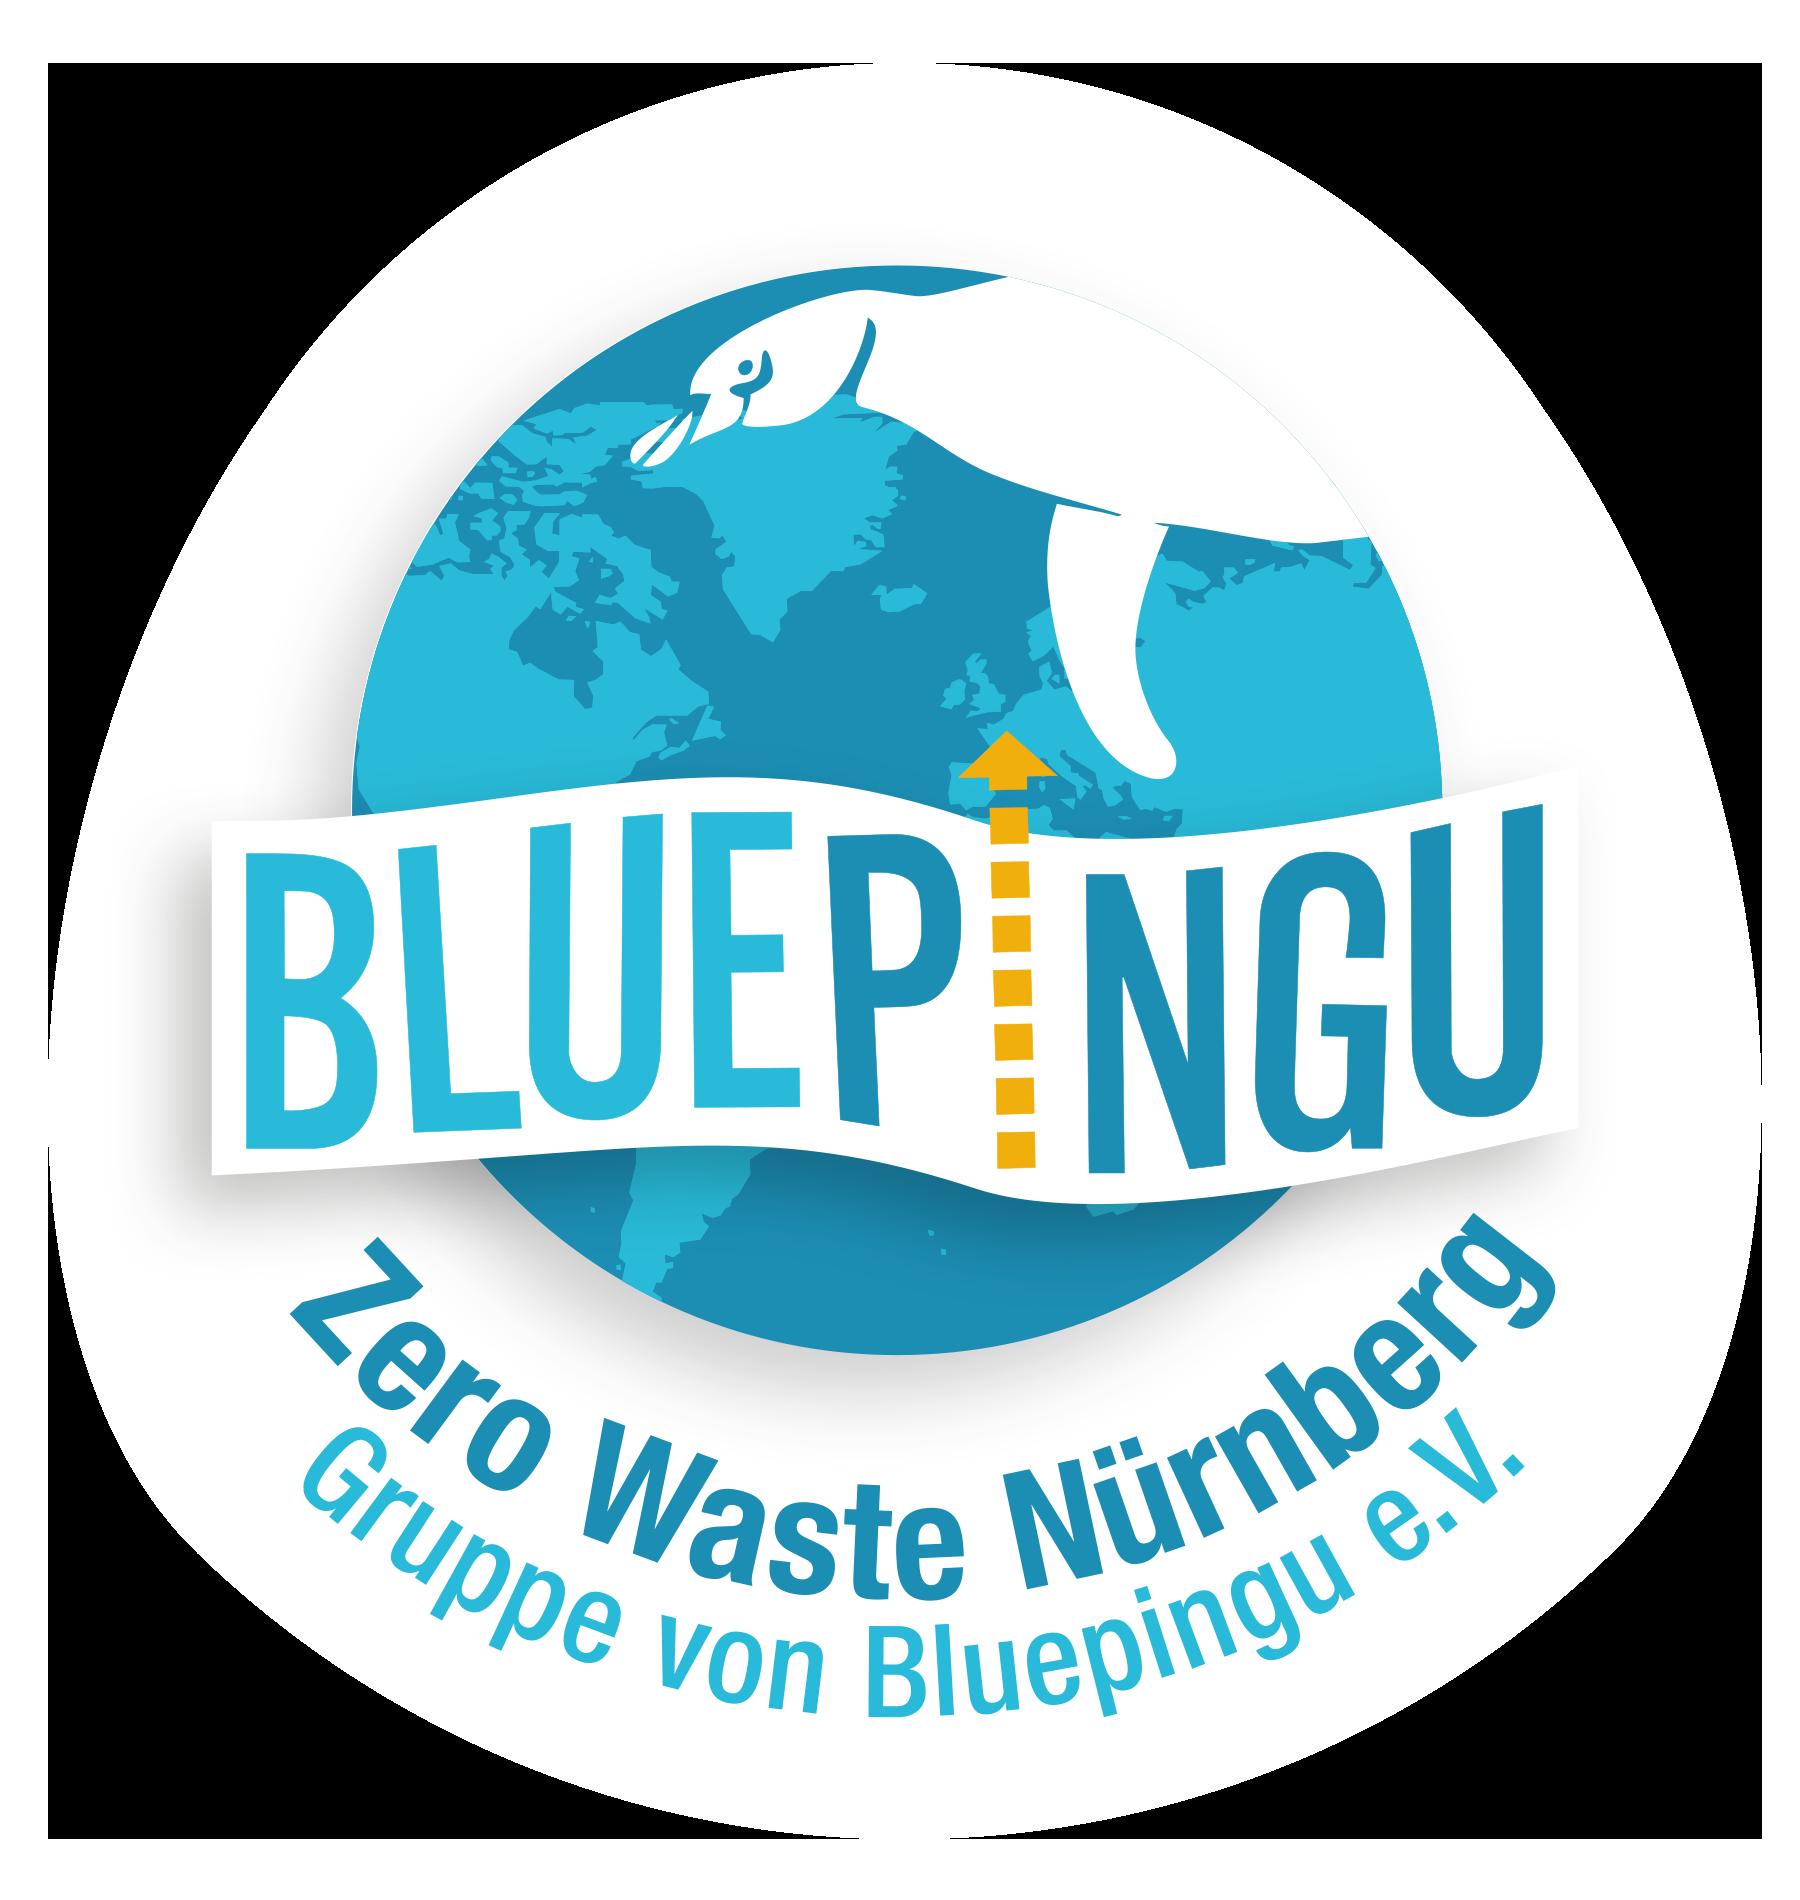 Logo Zerowaste Nbg